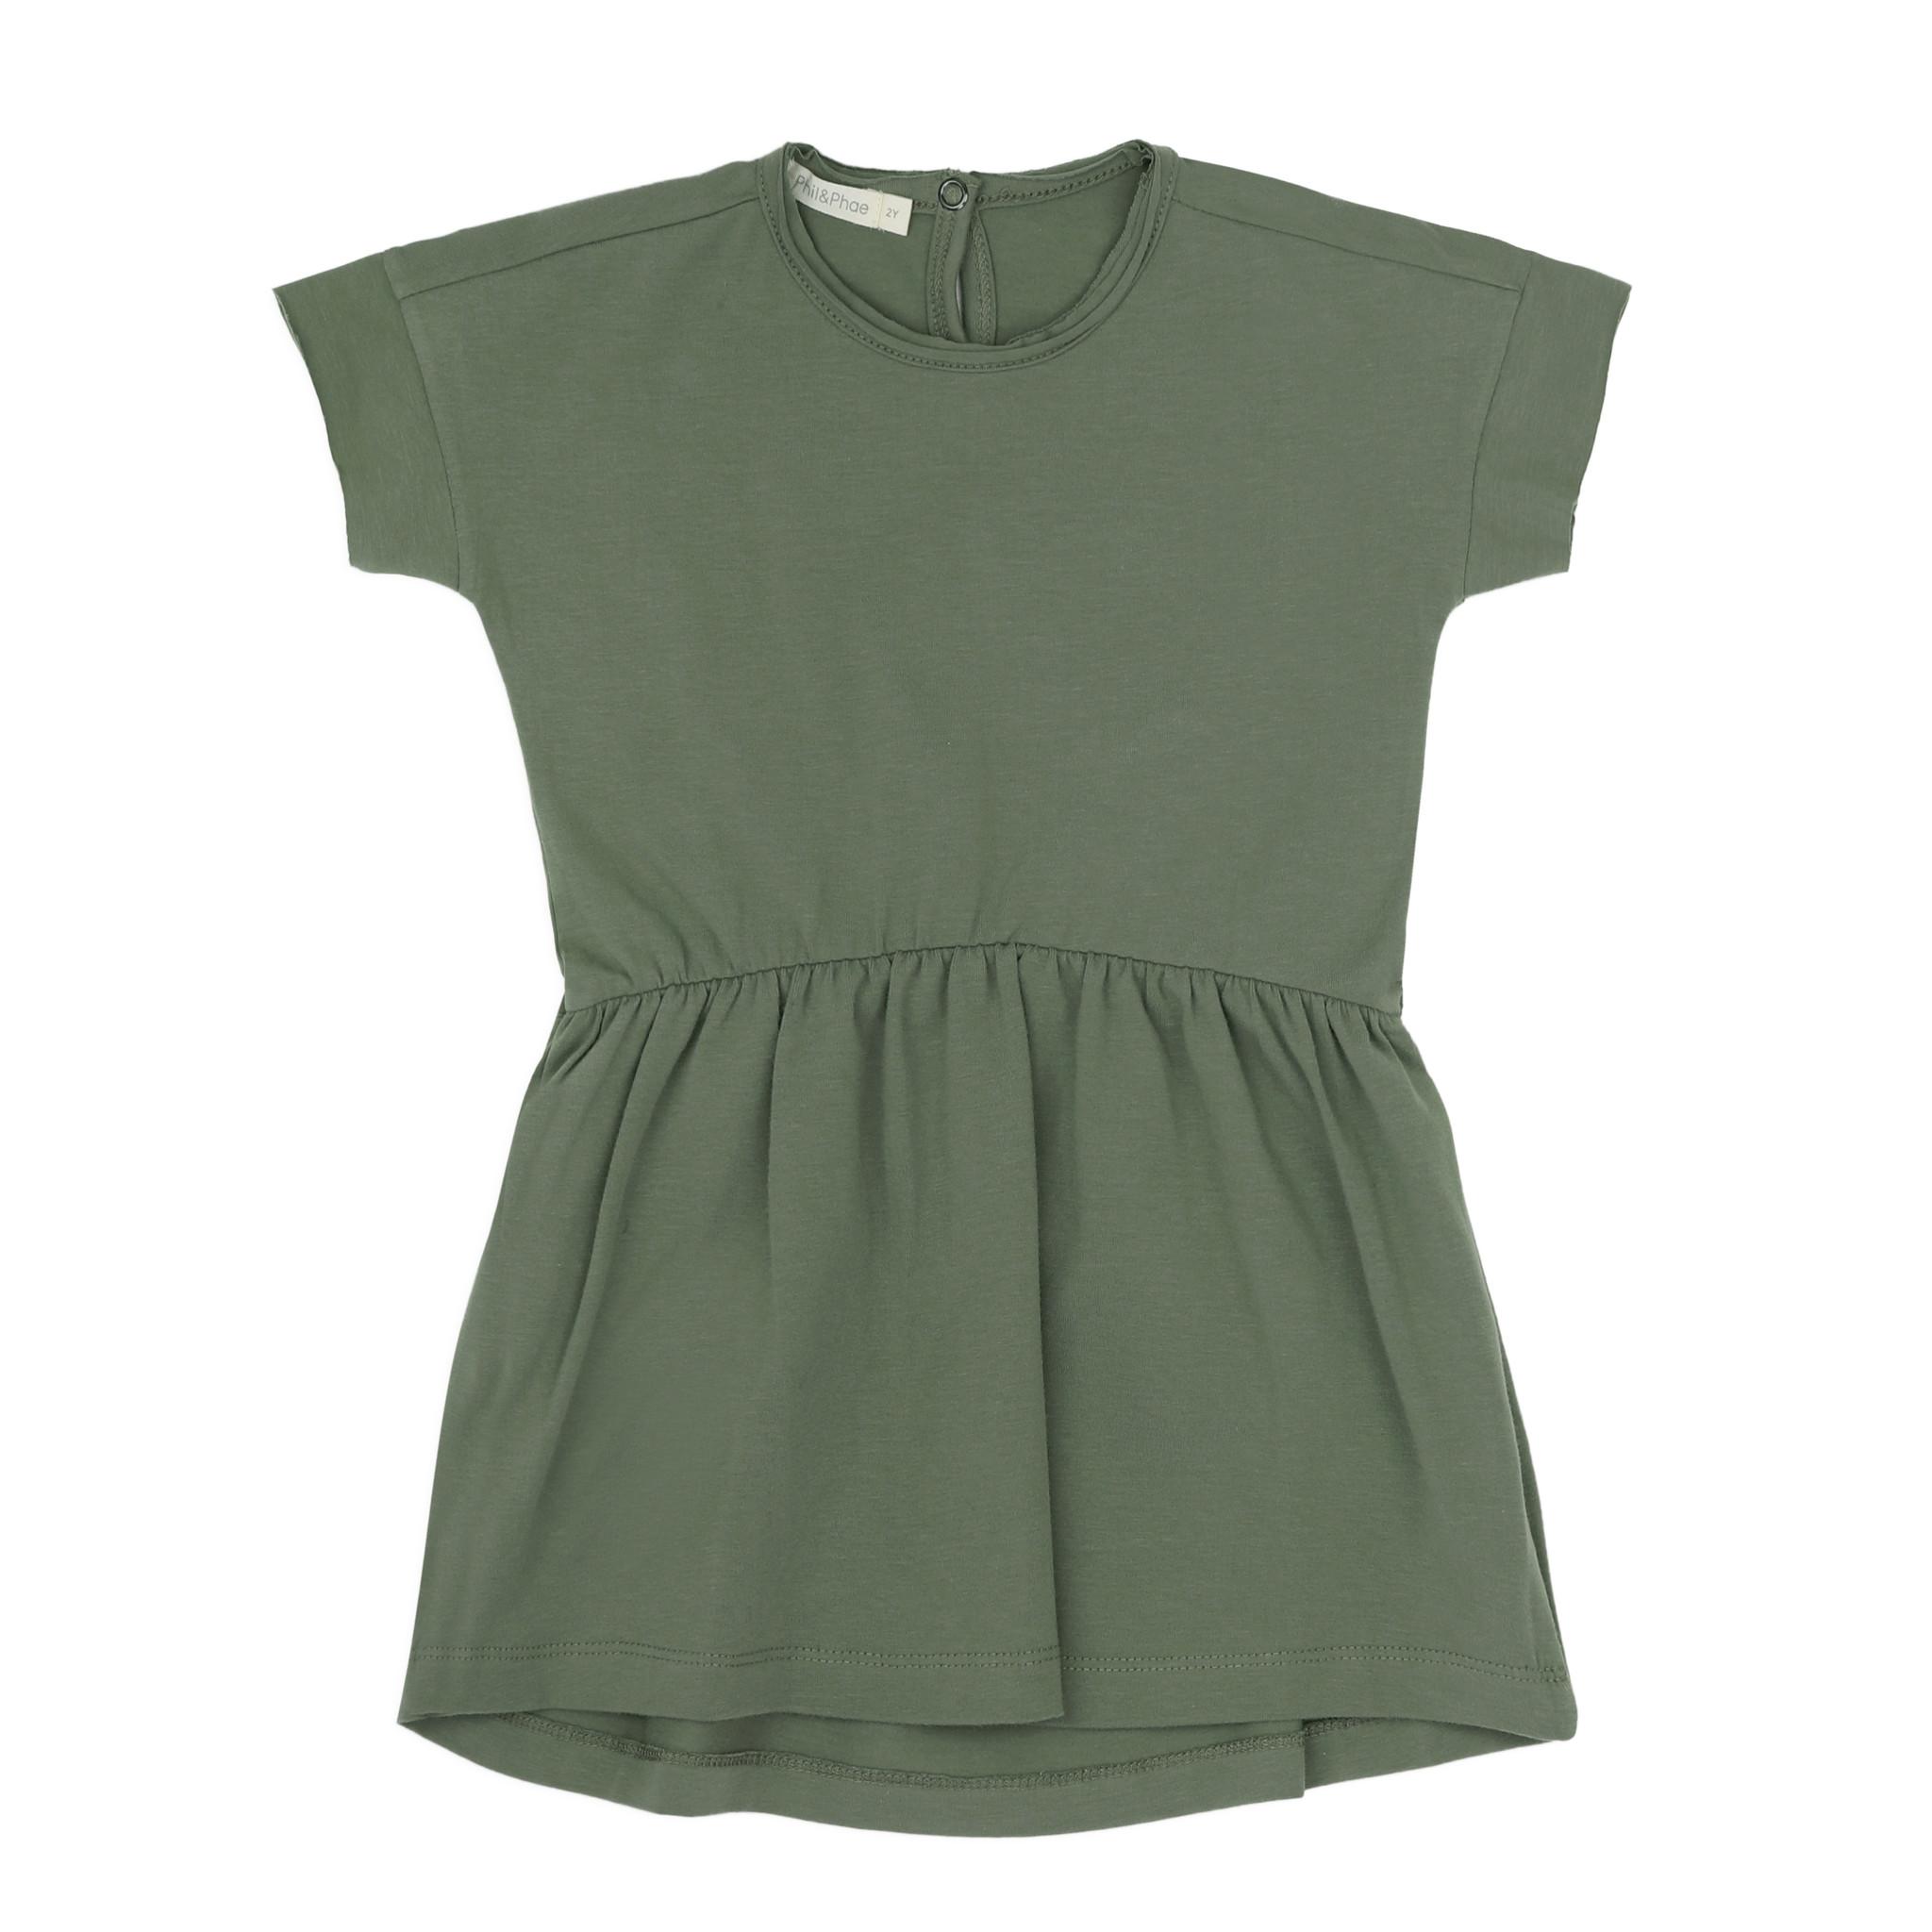 Oversized jersey dress s/s - Sage-1